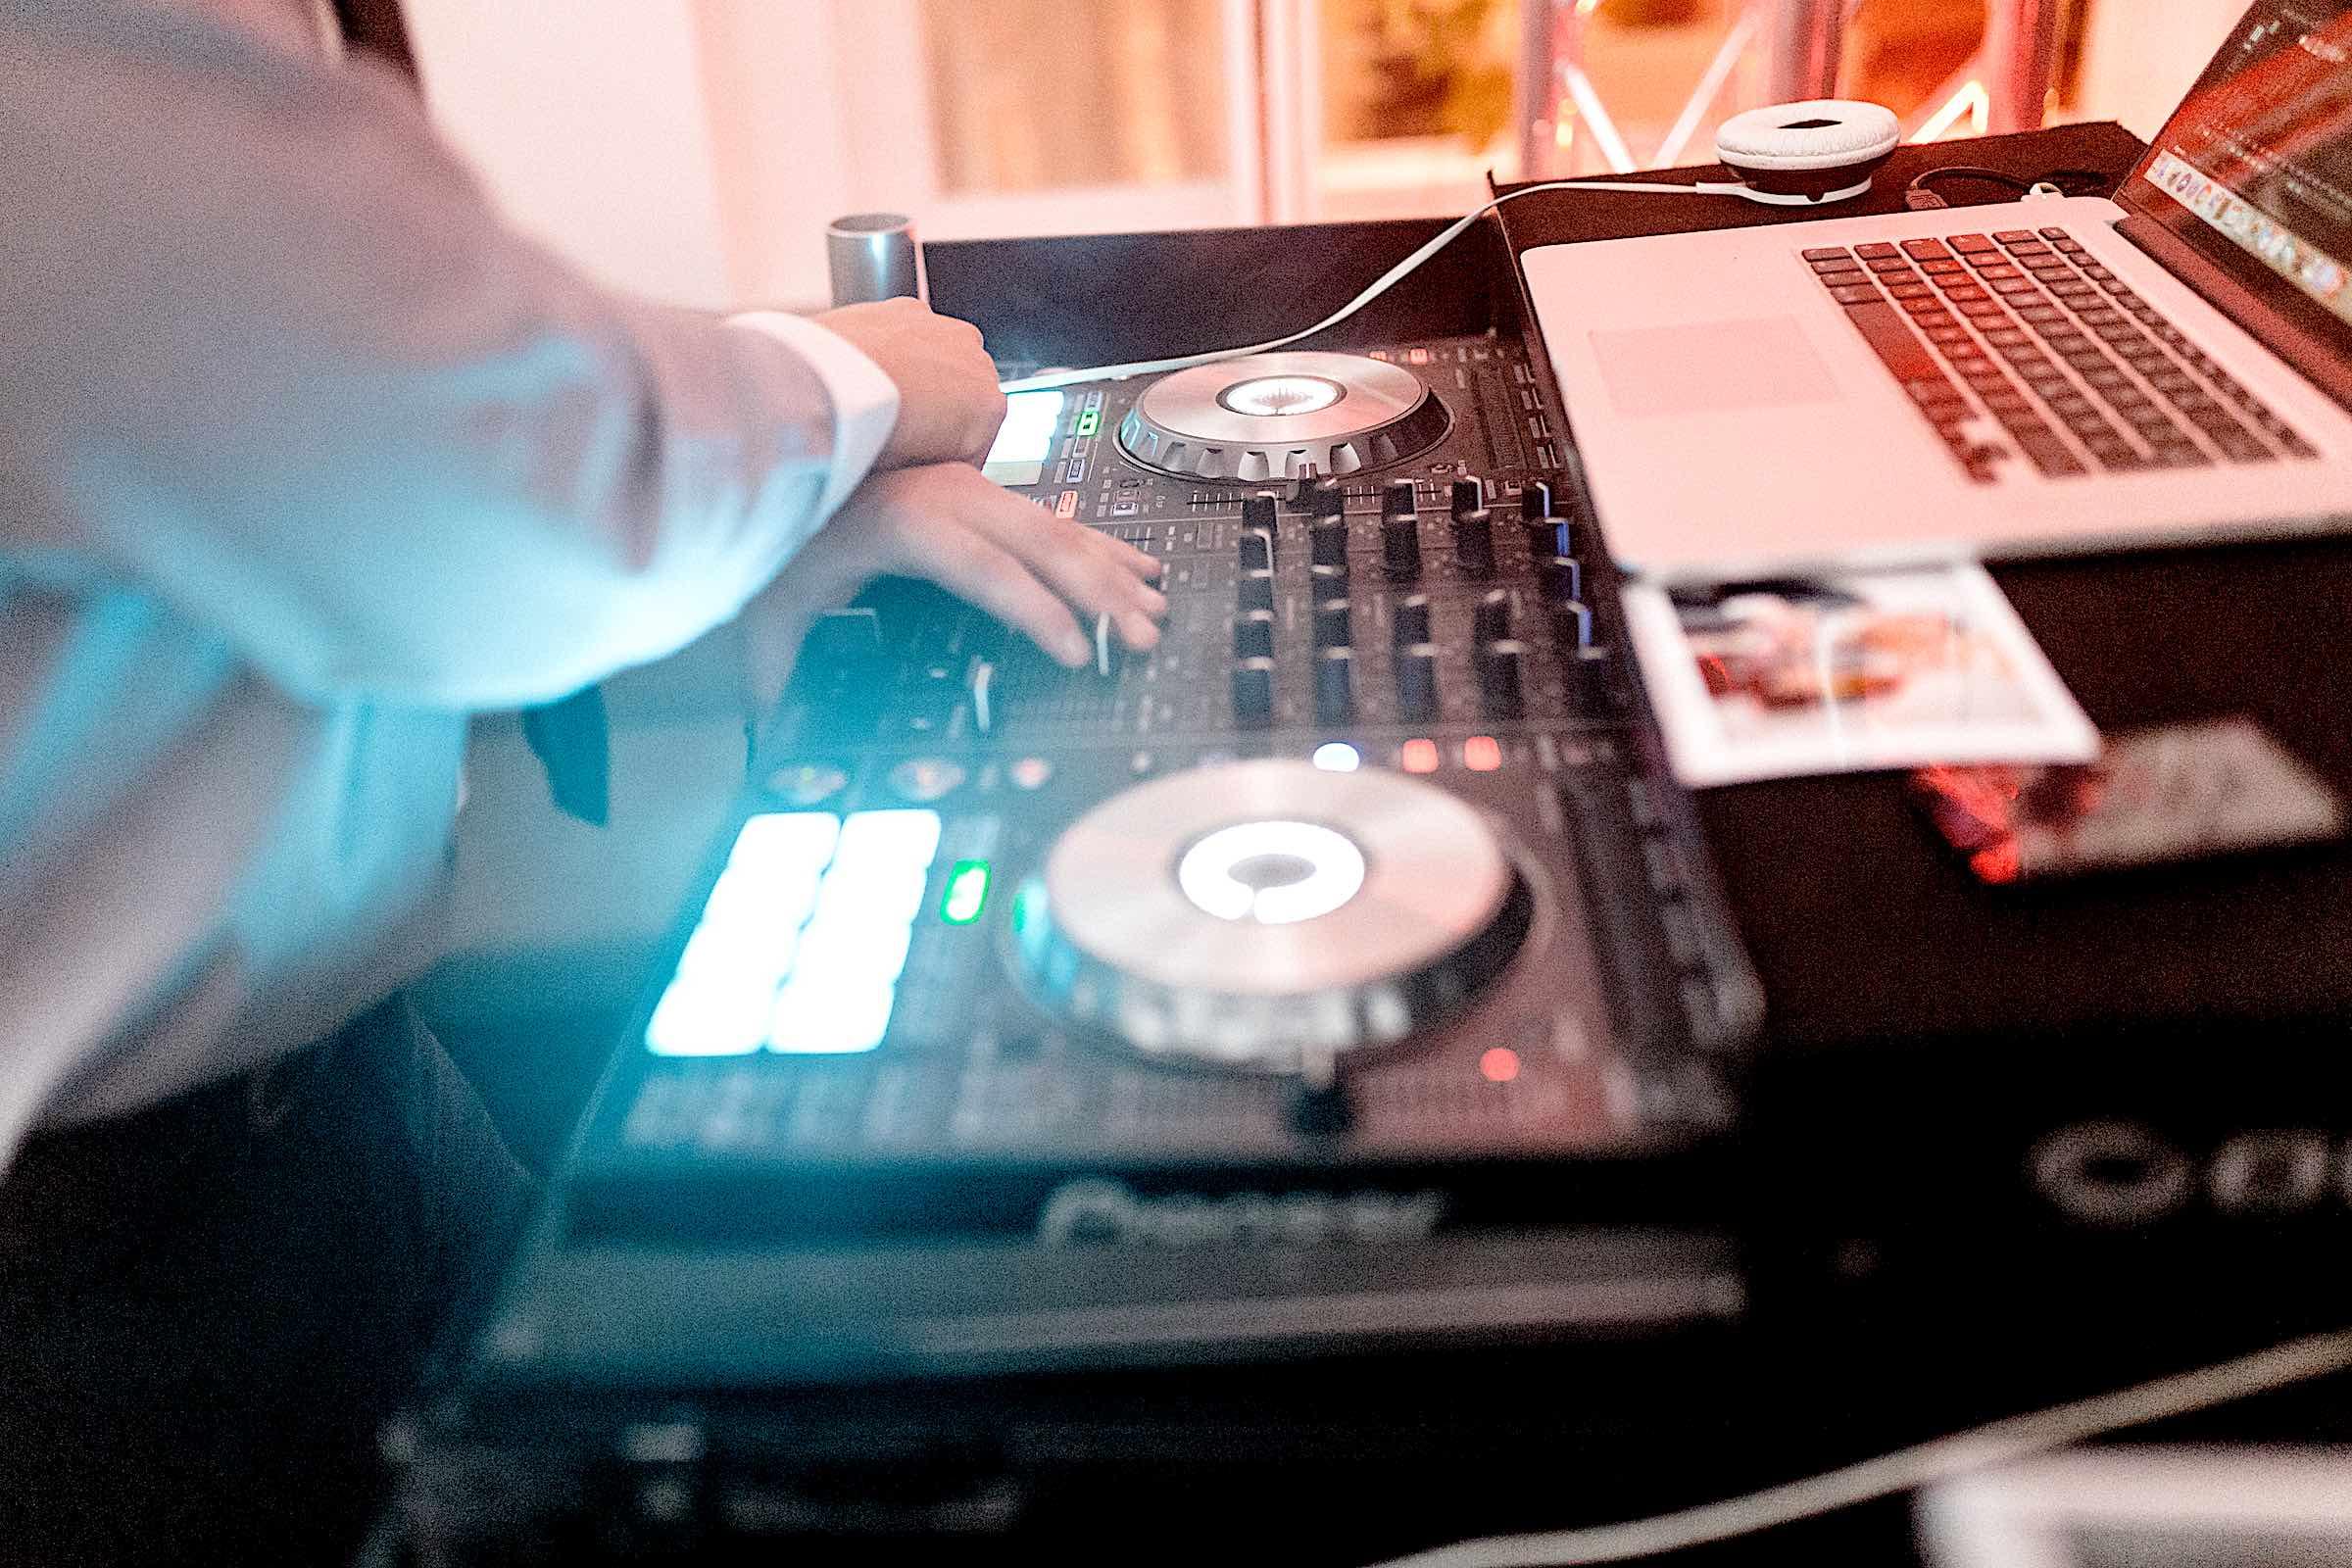 DJ | Agentur | Service | Buchen | DJ | Firmenfeier | DJ | Hochzeit | DJ | Geburtstag | DJ | Technik | Setup | DJ | Buchen | Discjockey | Mieten | DJ | Buchen | Mieten | Eventservice